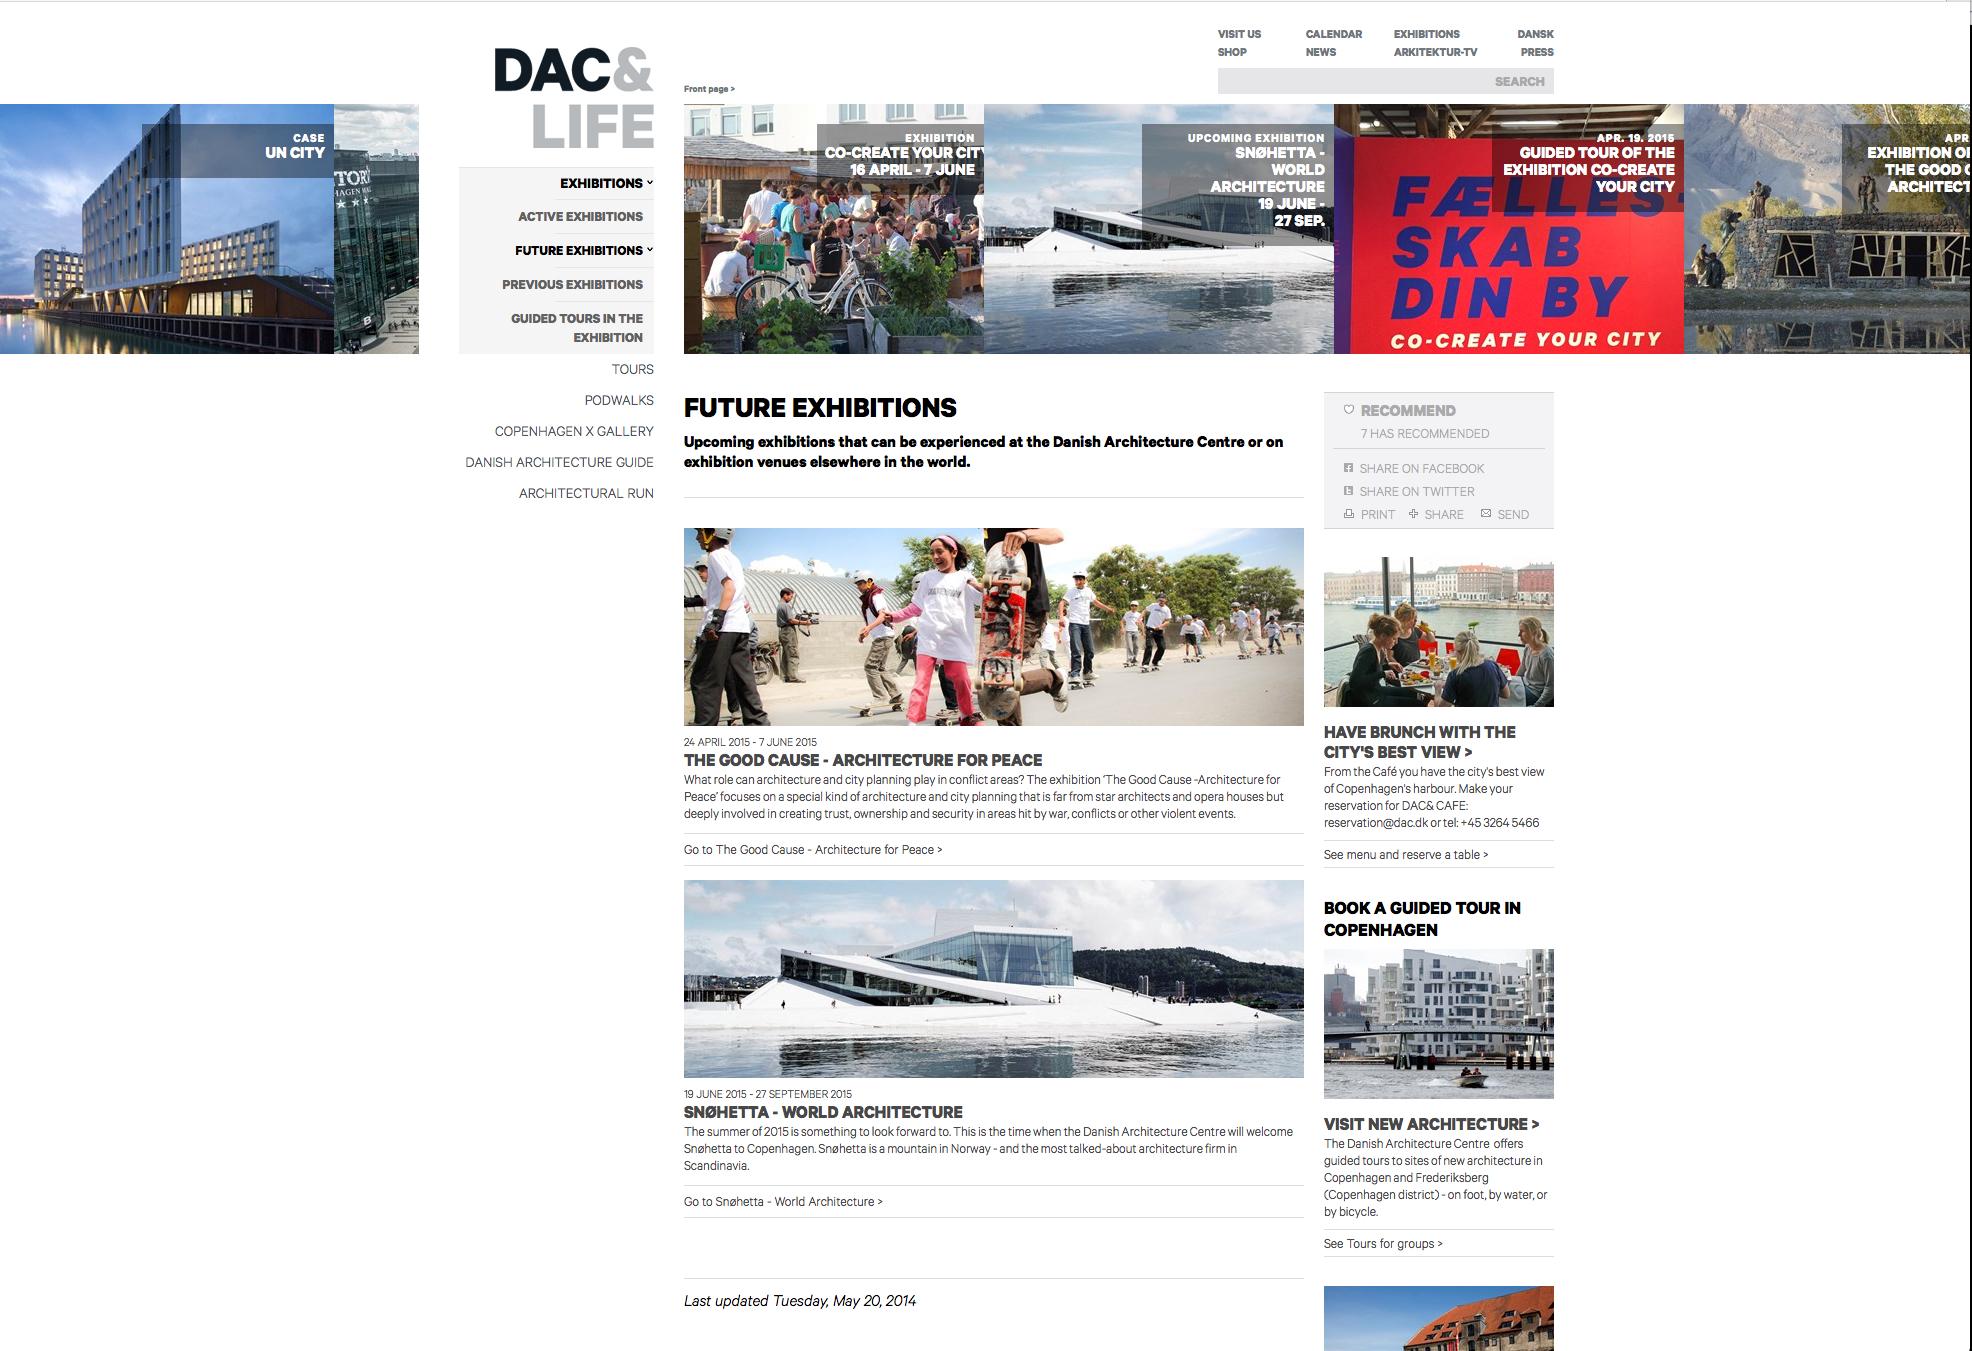 DAC site 2 copy.jpg